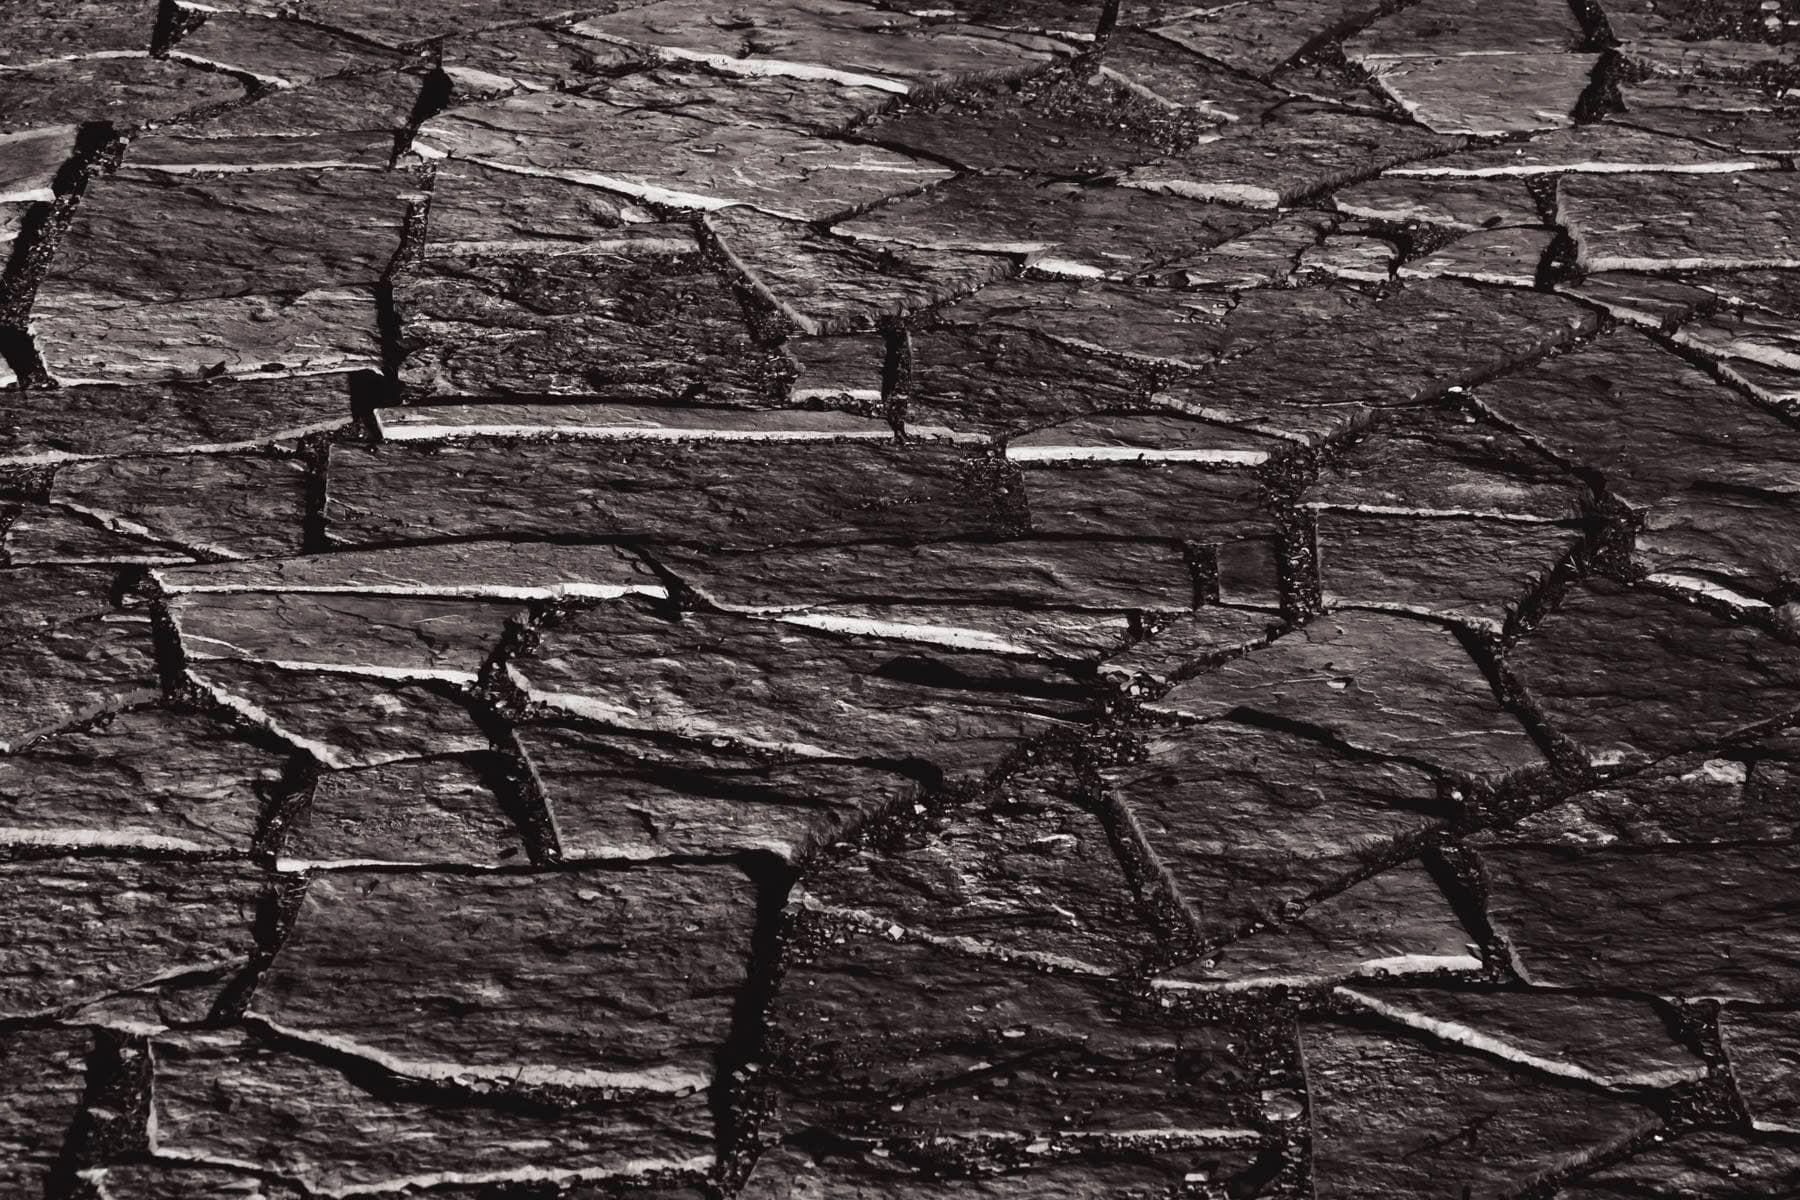 Rough-hewn flagstones stones form a sidewalk in Addison Circle Park, Addison, Texas.